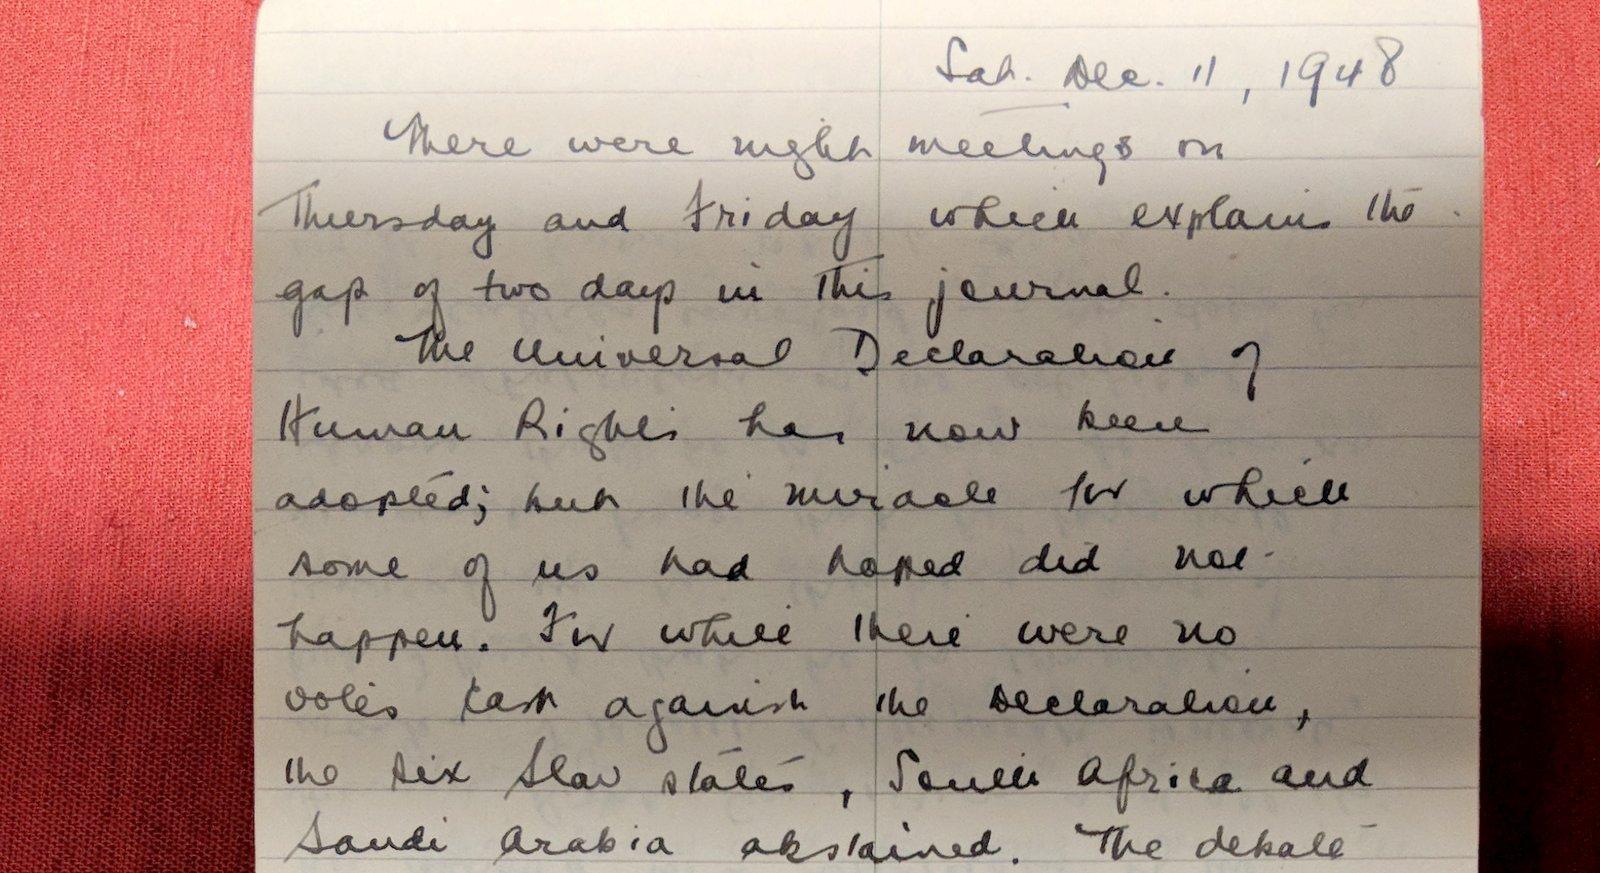 John Humphrey's diary entry, December 11, 1948. Credit: Jacquelyn Sundberg